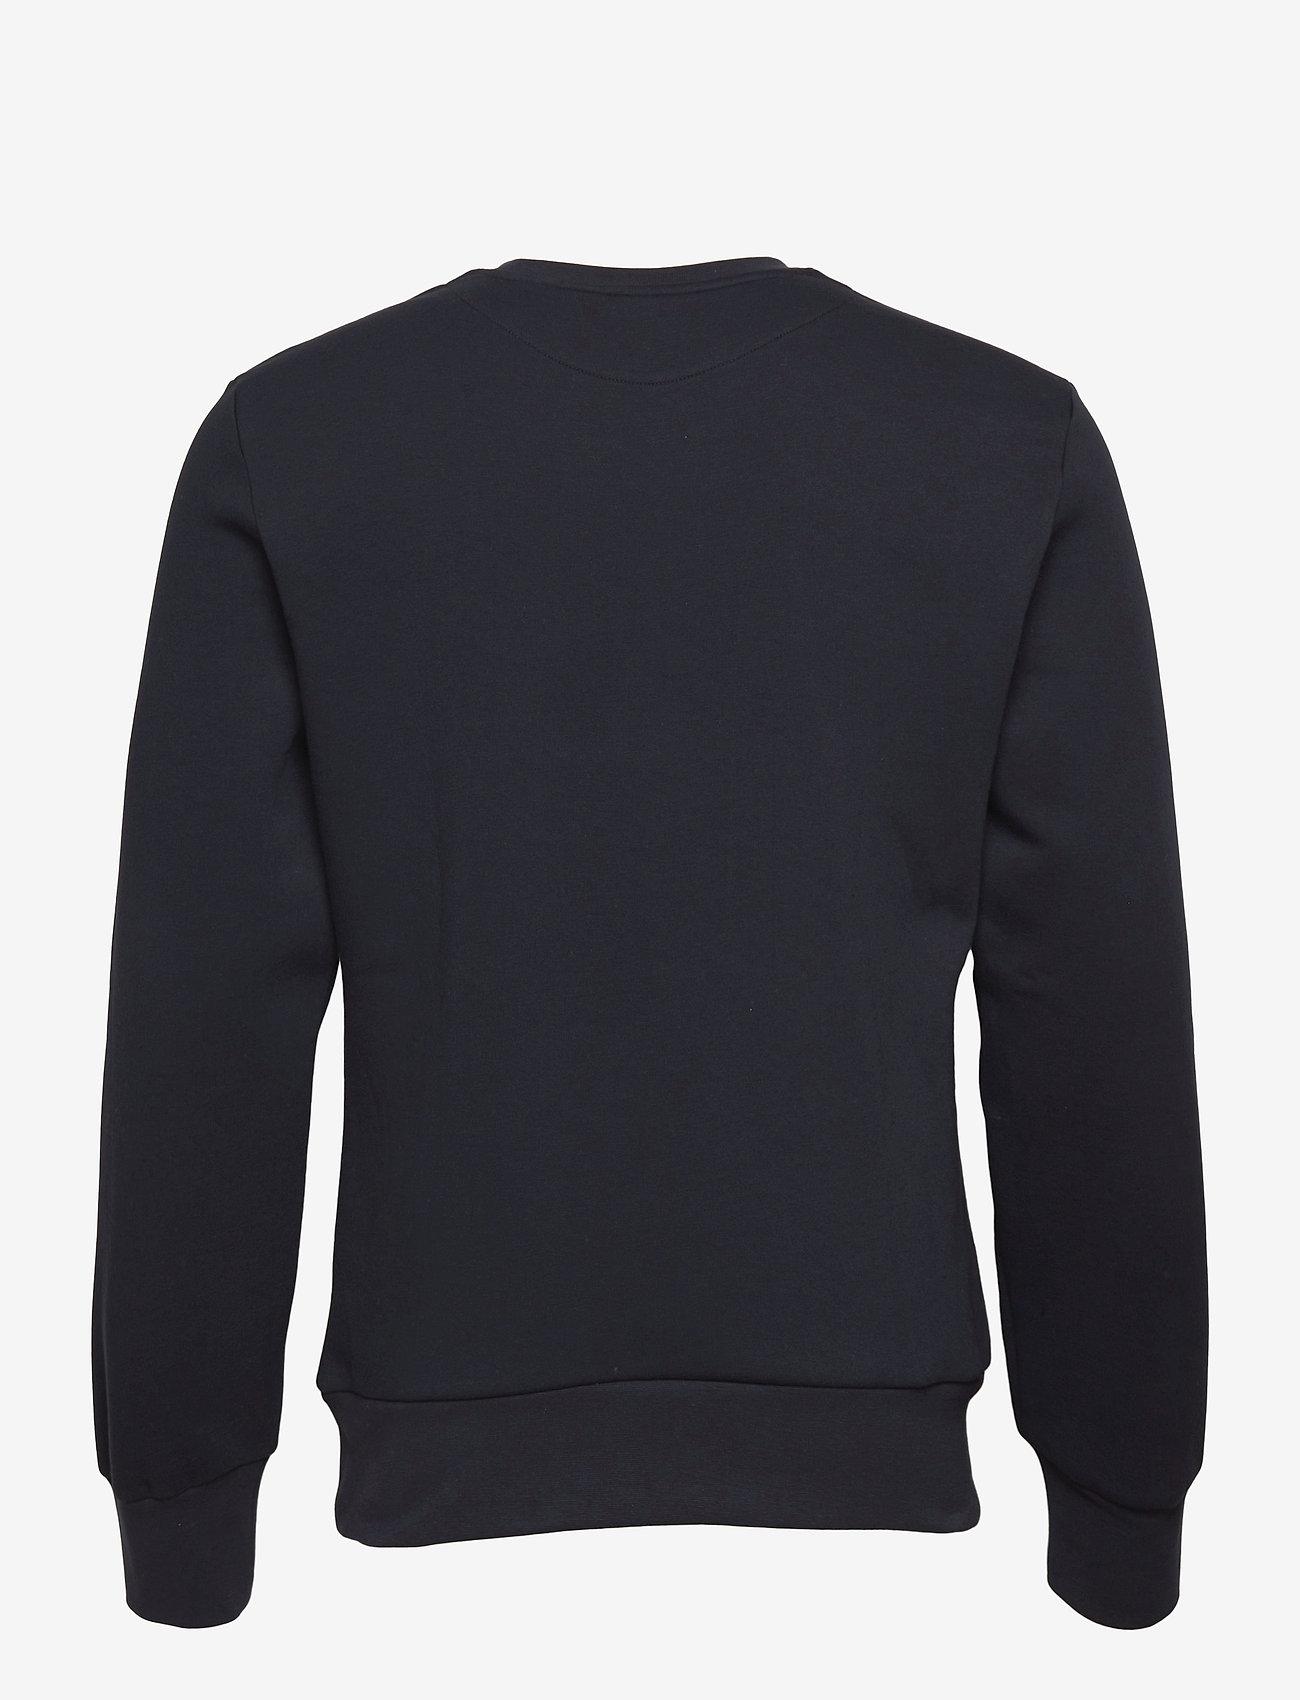 Björn Borg - CREW M BB LOGO M BB LOGO - basic sweatshirts - night sky - 1